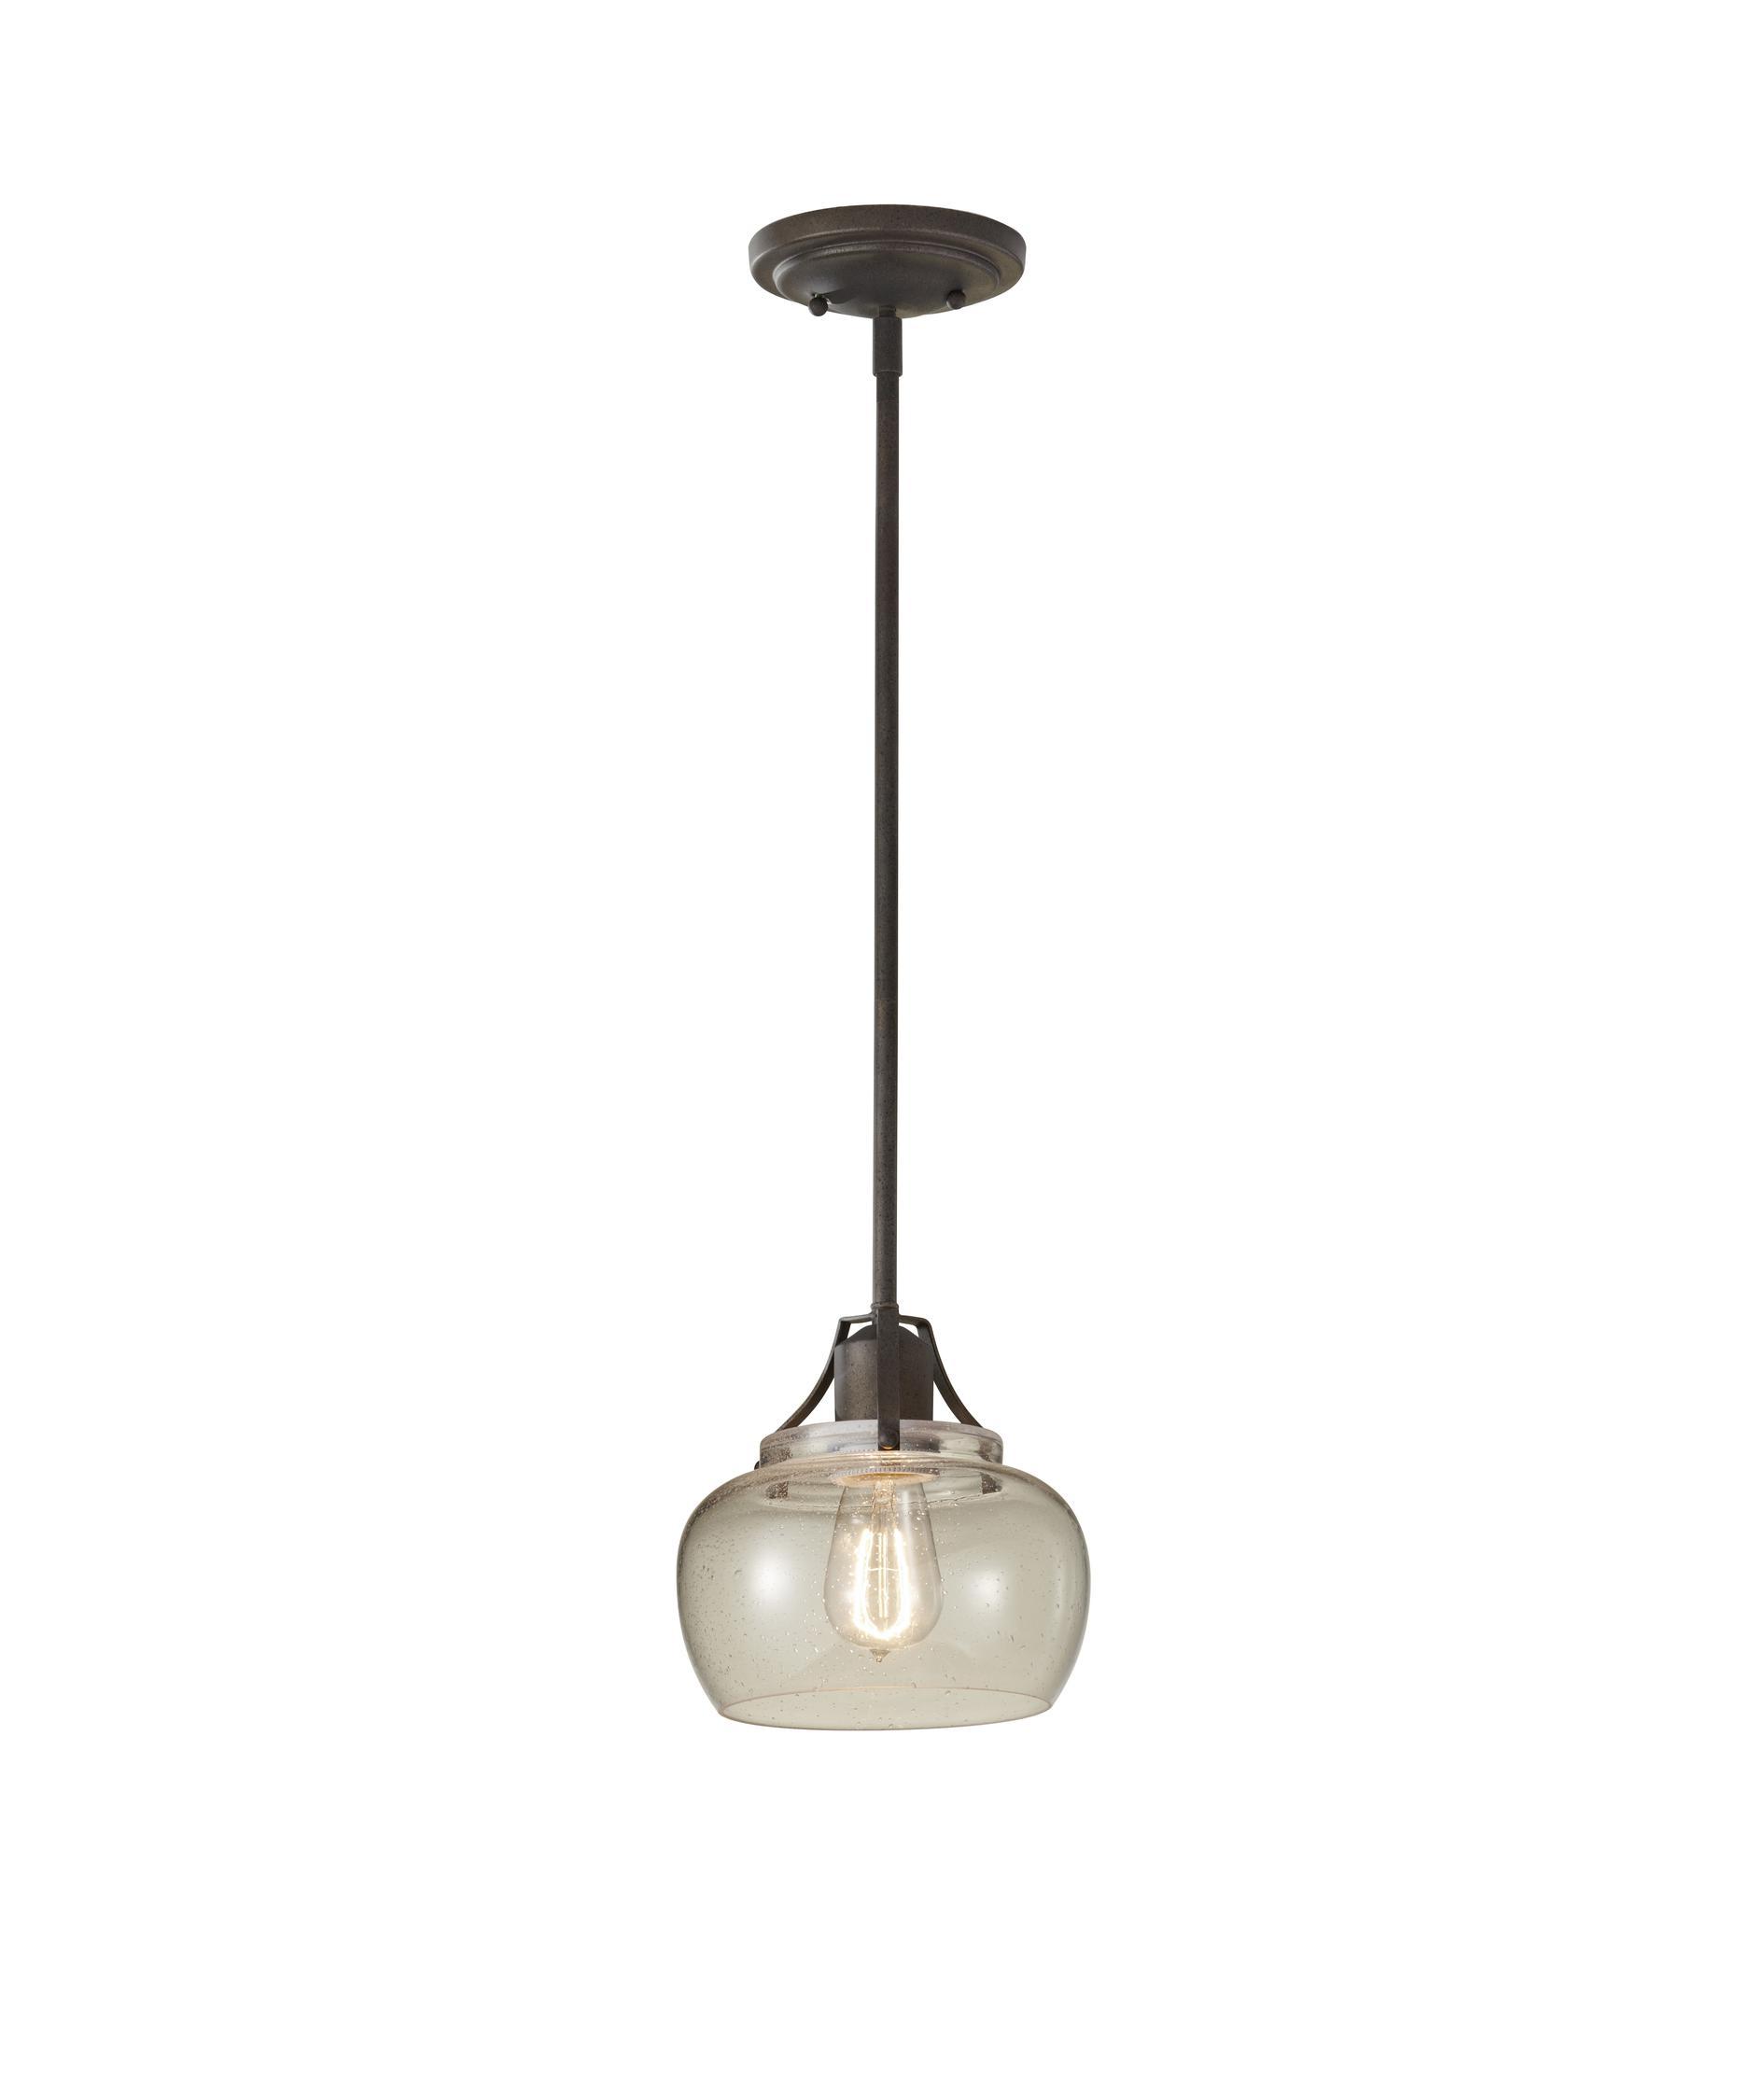 murray feiss p1234 urban renewal 8 inch wide 1 light mini pendant capitol lighting - Feiss Lighting